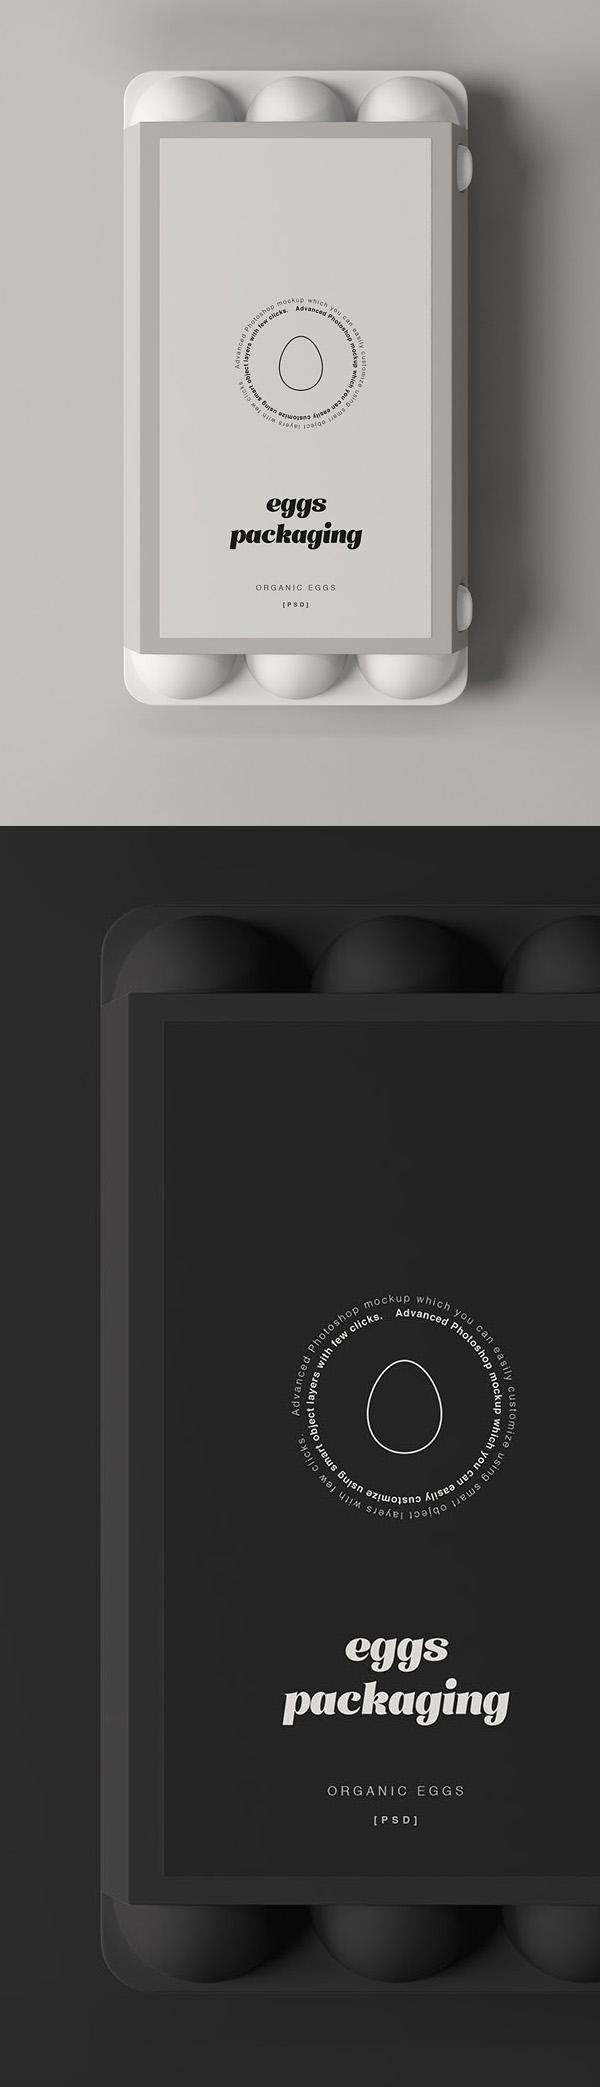 Free Egg Packaging Mockup PSD